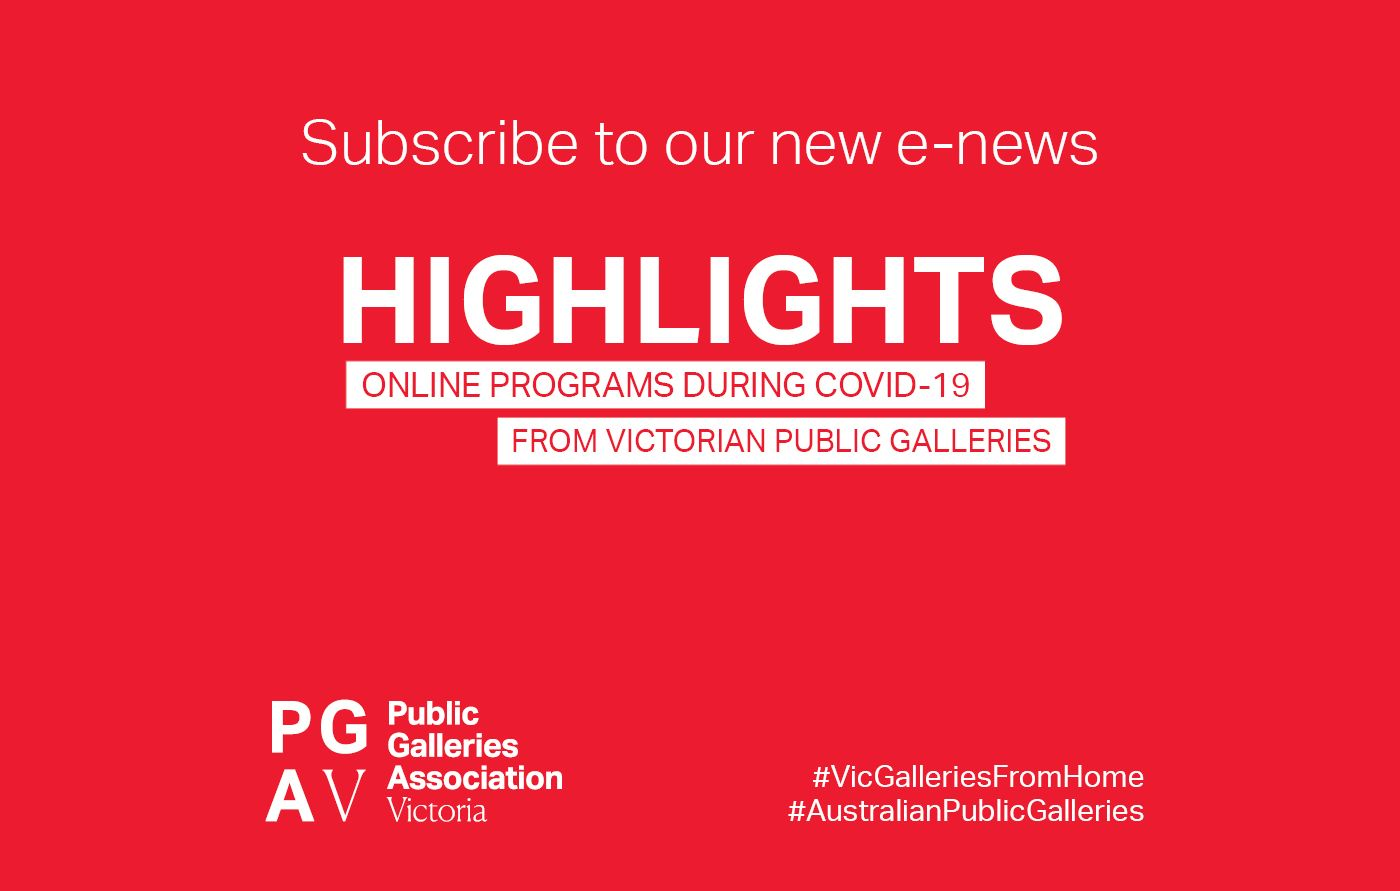 Highlights NewsletterSubscribe website